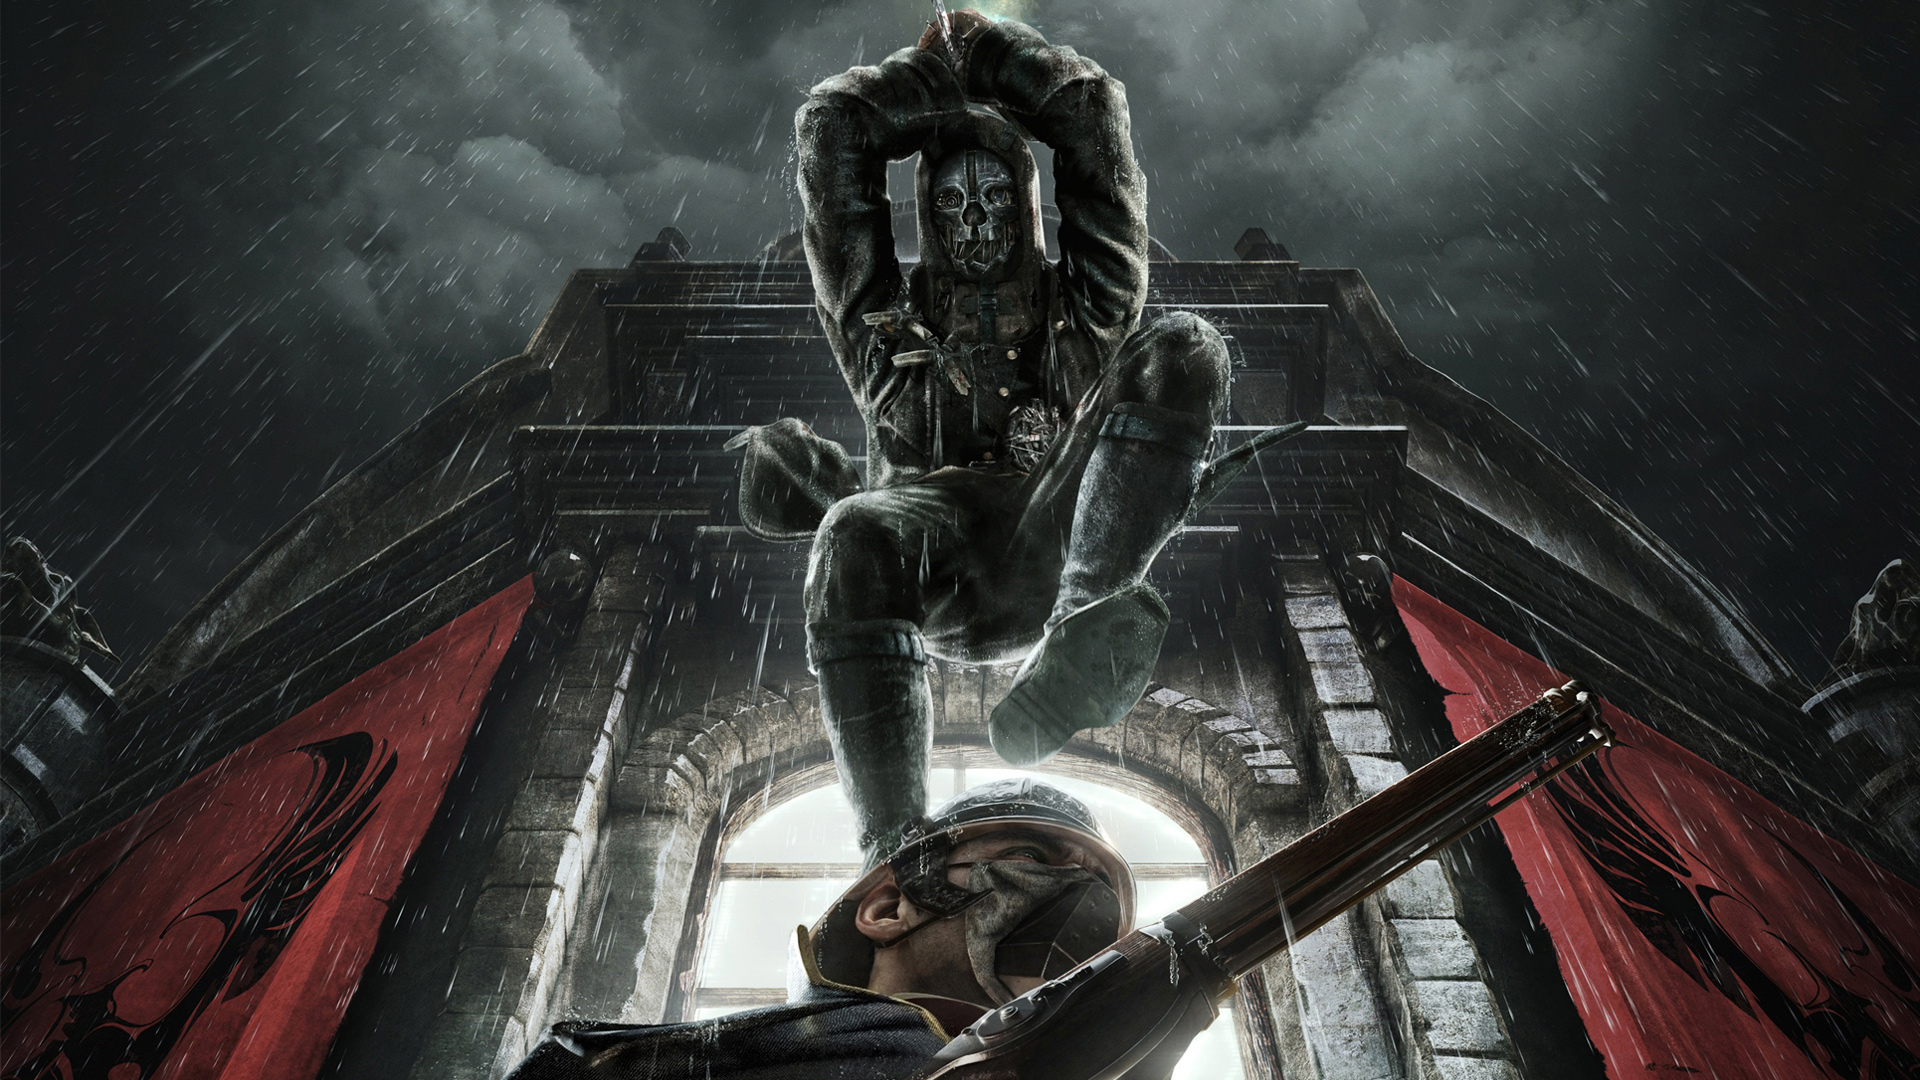 Dishonored Corvo Mask wallpaper.